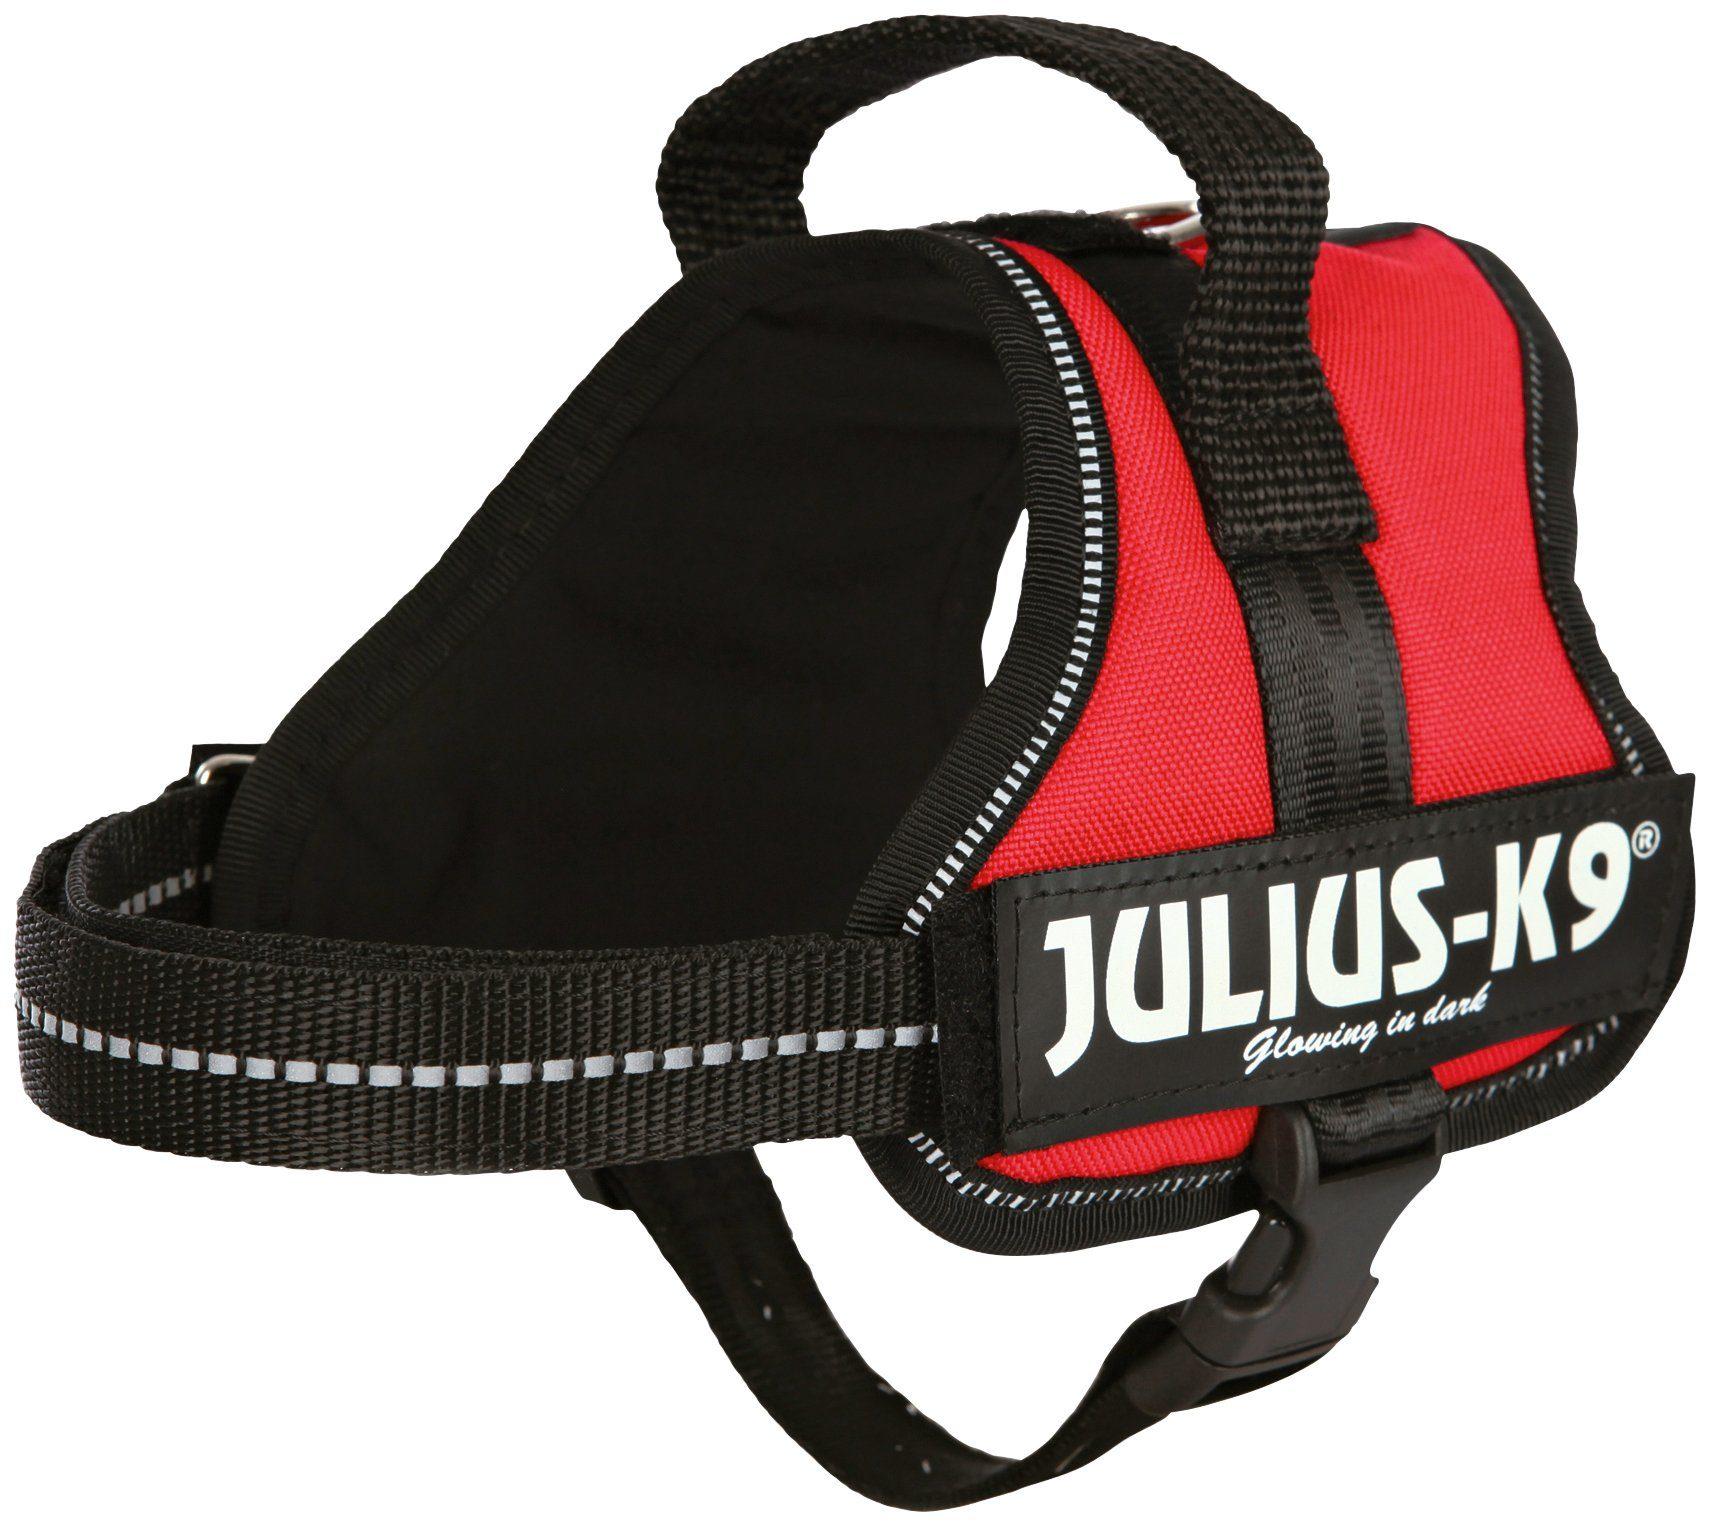 Hunde-Geschirr »Julius-K9 Mini-Mini/S«, rot, 40-53 cm